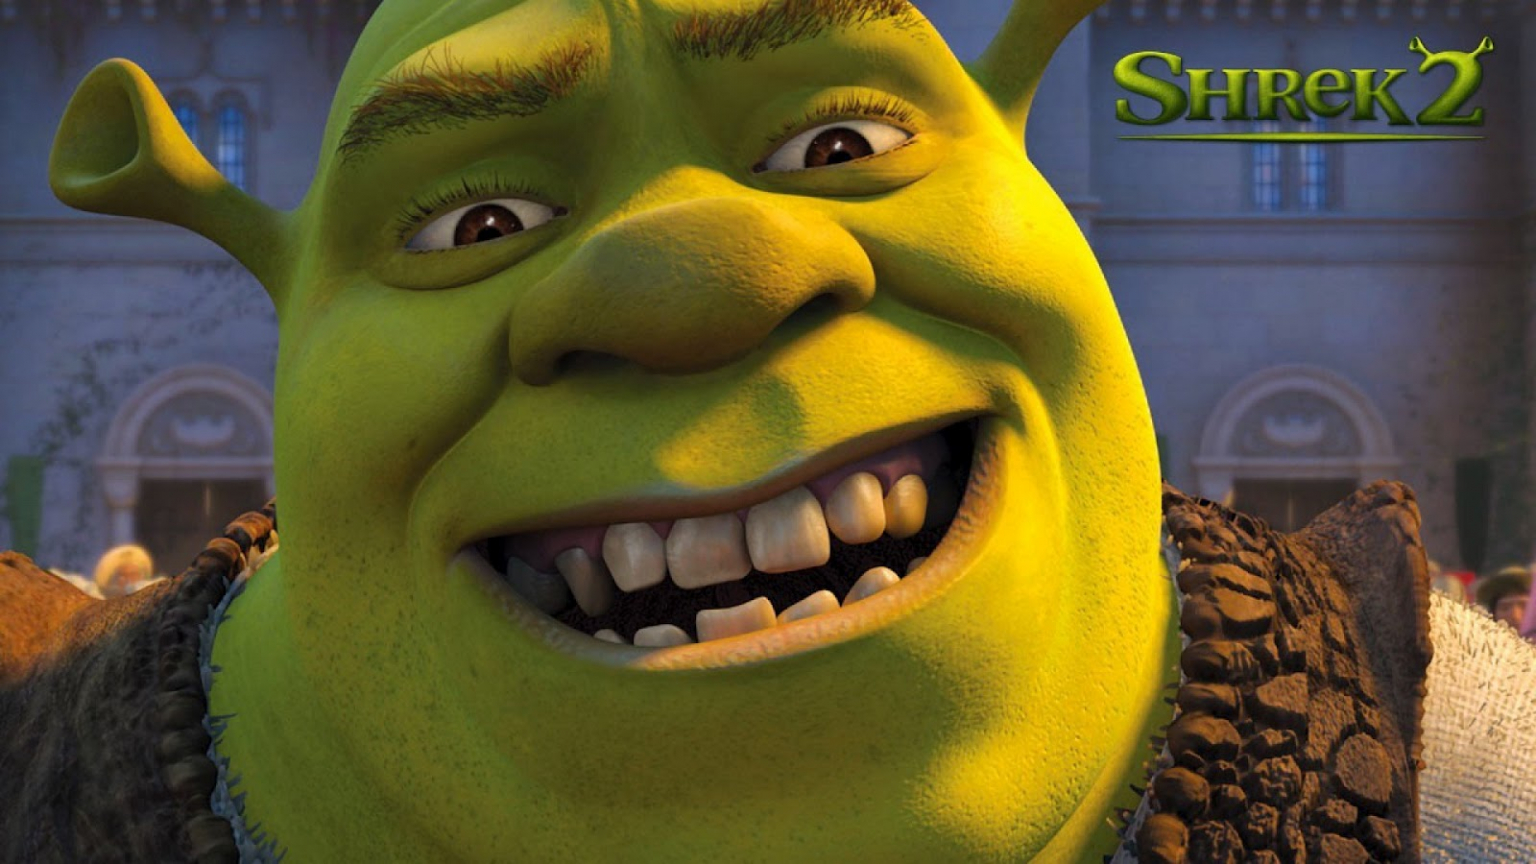 Free Download Shrek 2 Wallpaper Pictures 1600x900 For Your Desktop Mobile Tablet Explore 43 Shrek 2 Wallpaper Shrek 2 Wallpaper Fiona Wallpapers Shrek 2 Shrek Wallpapers